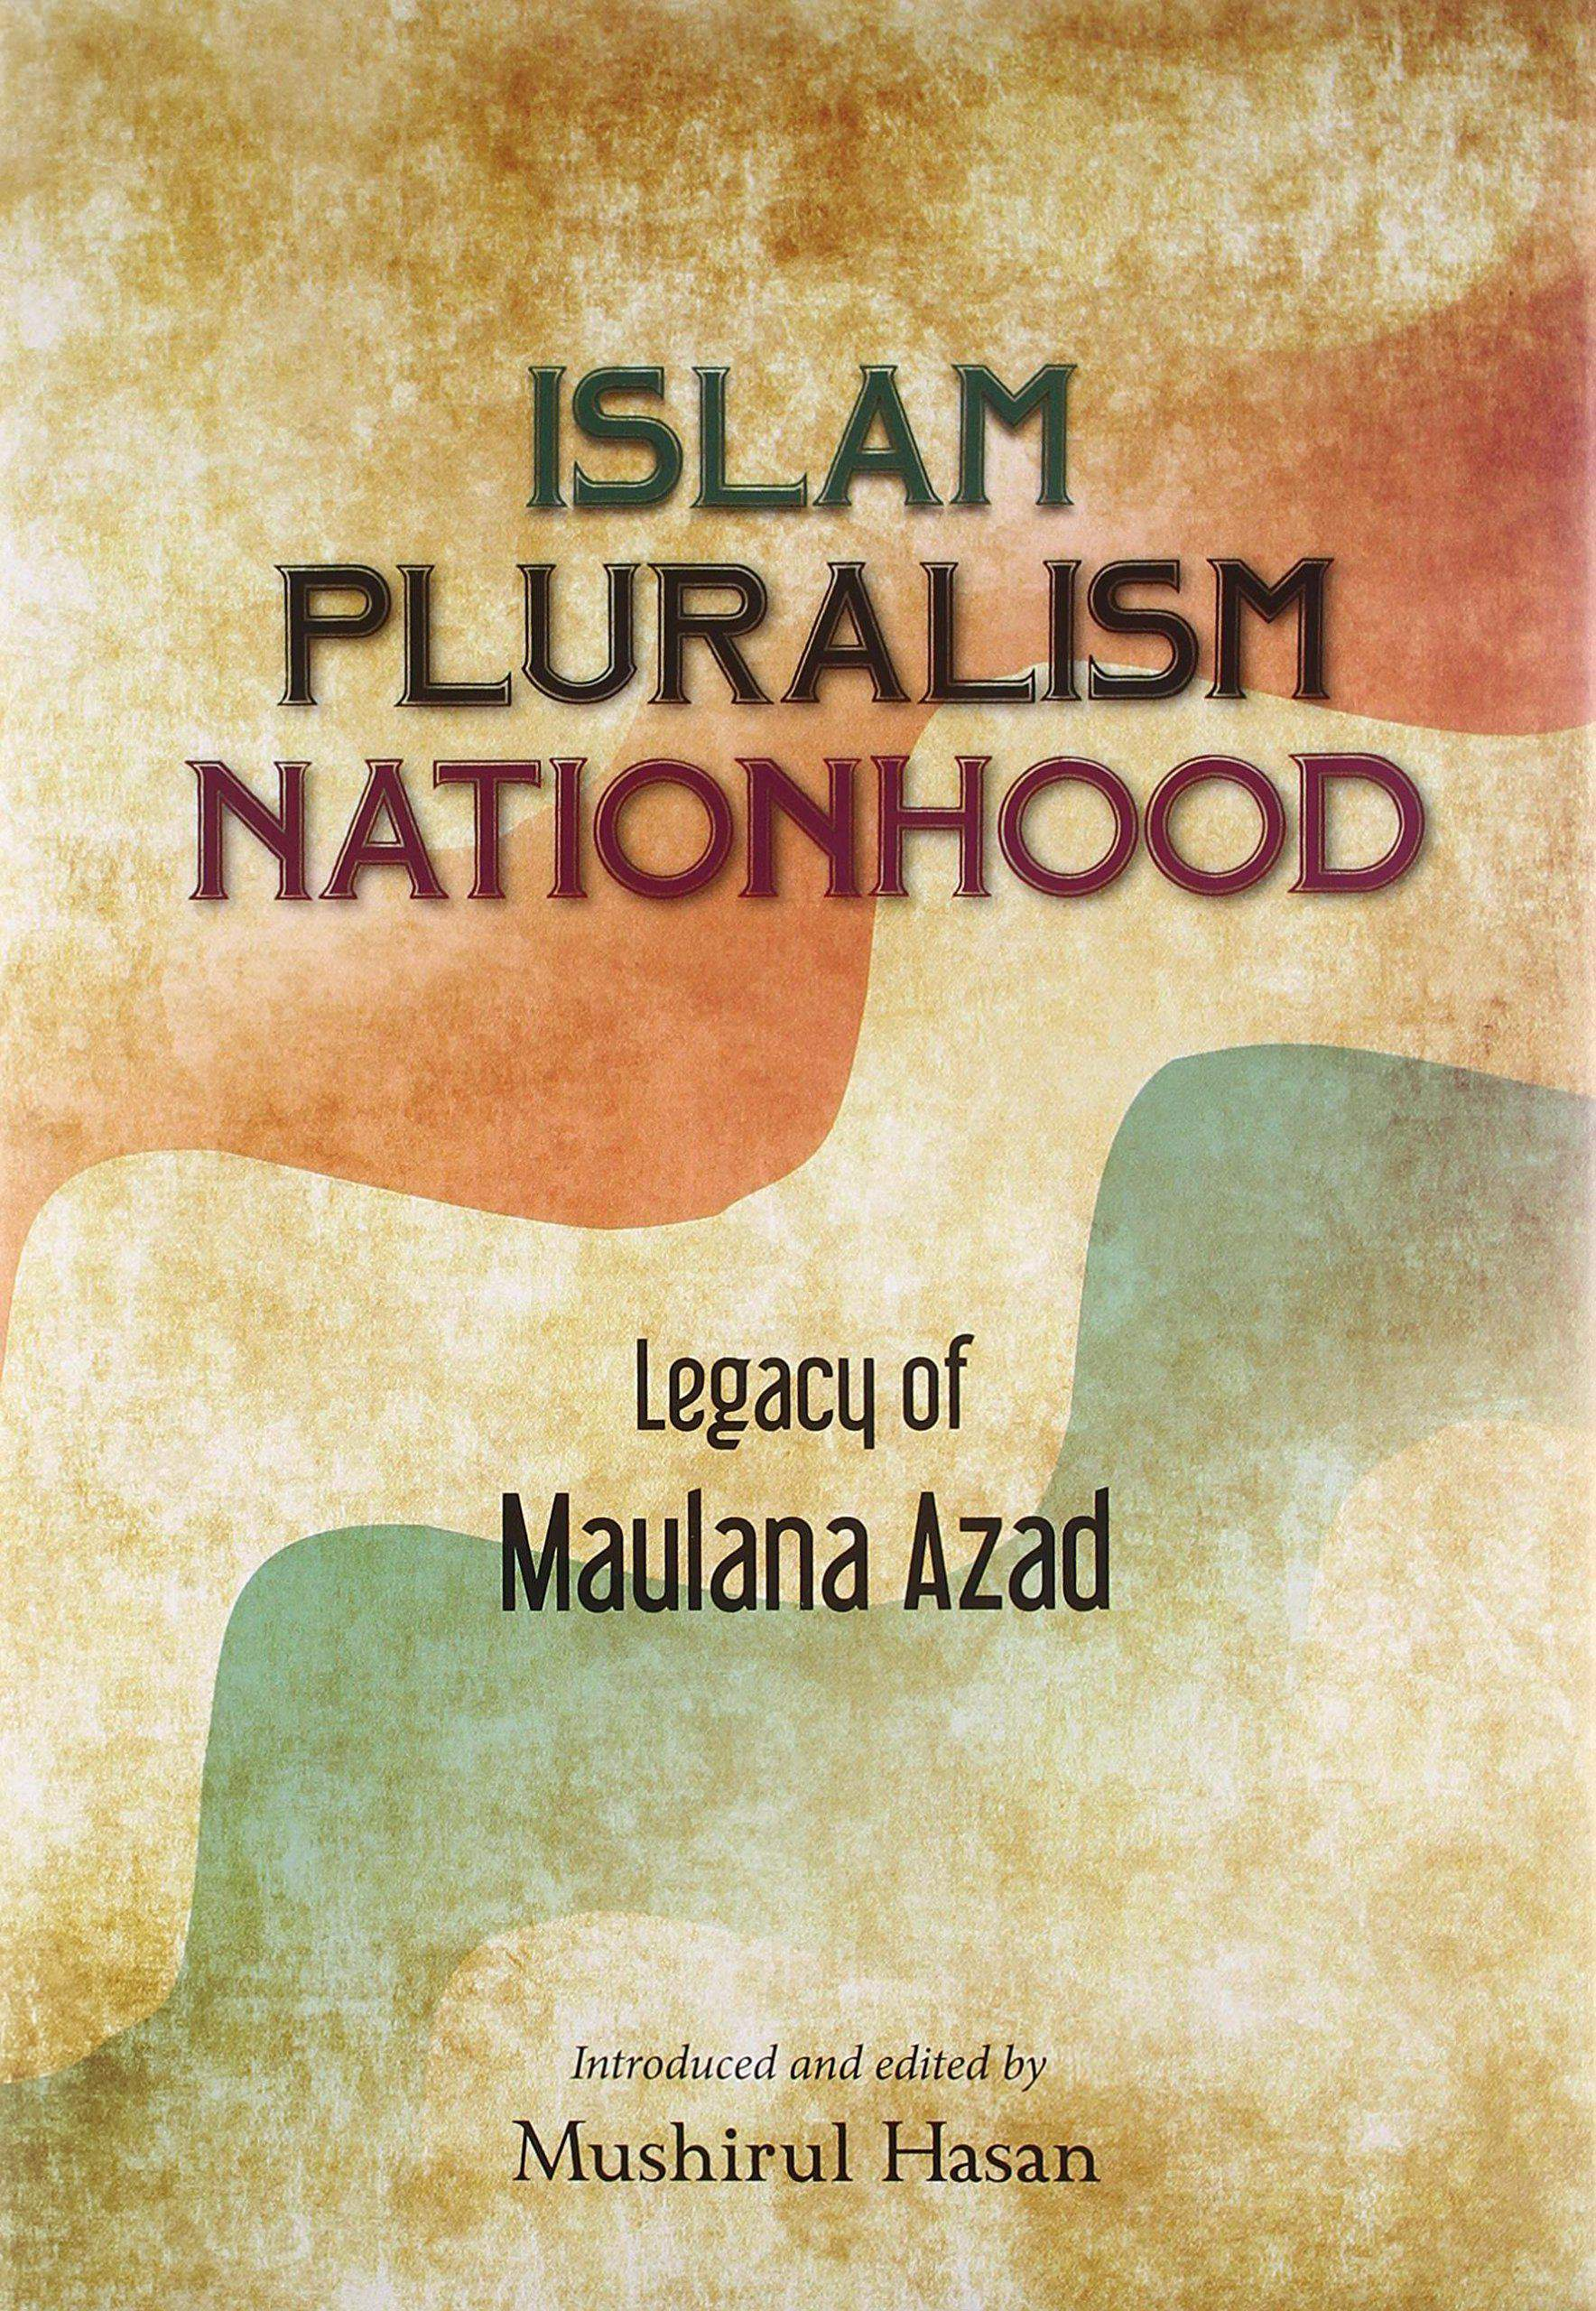 Legacy of Maulana Azad: Islam Pluralism Nationhood